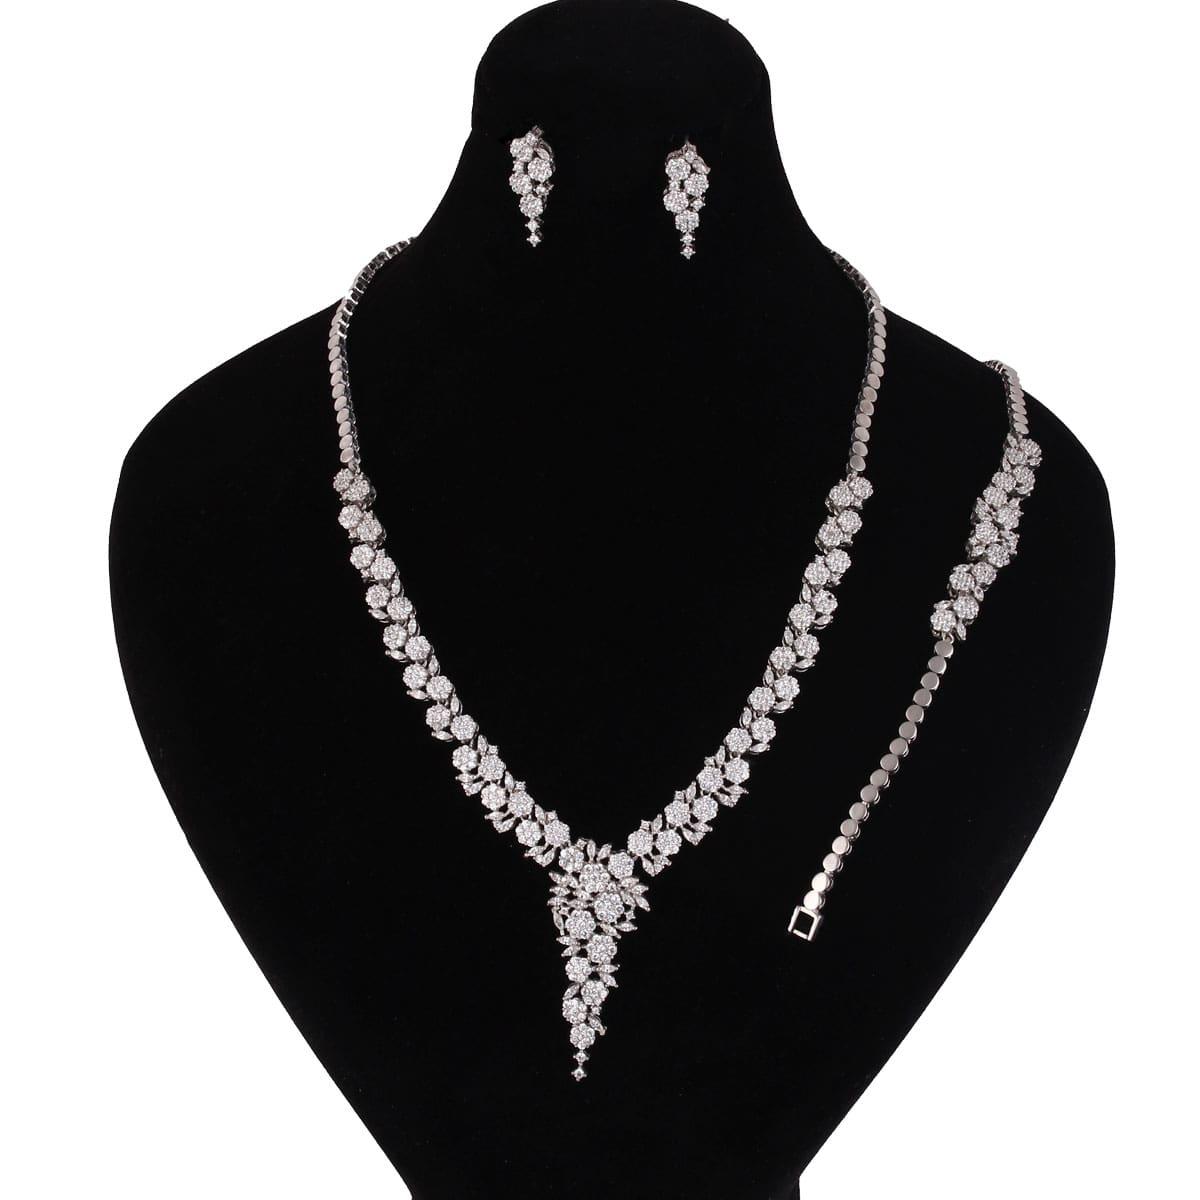 خرید سرویس نقره زنانه مدل لوییز